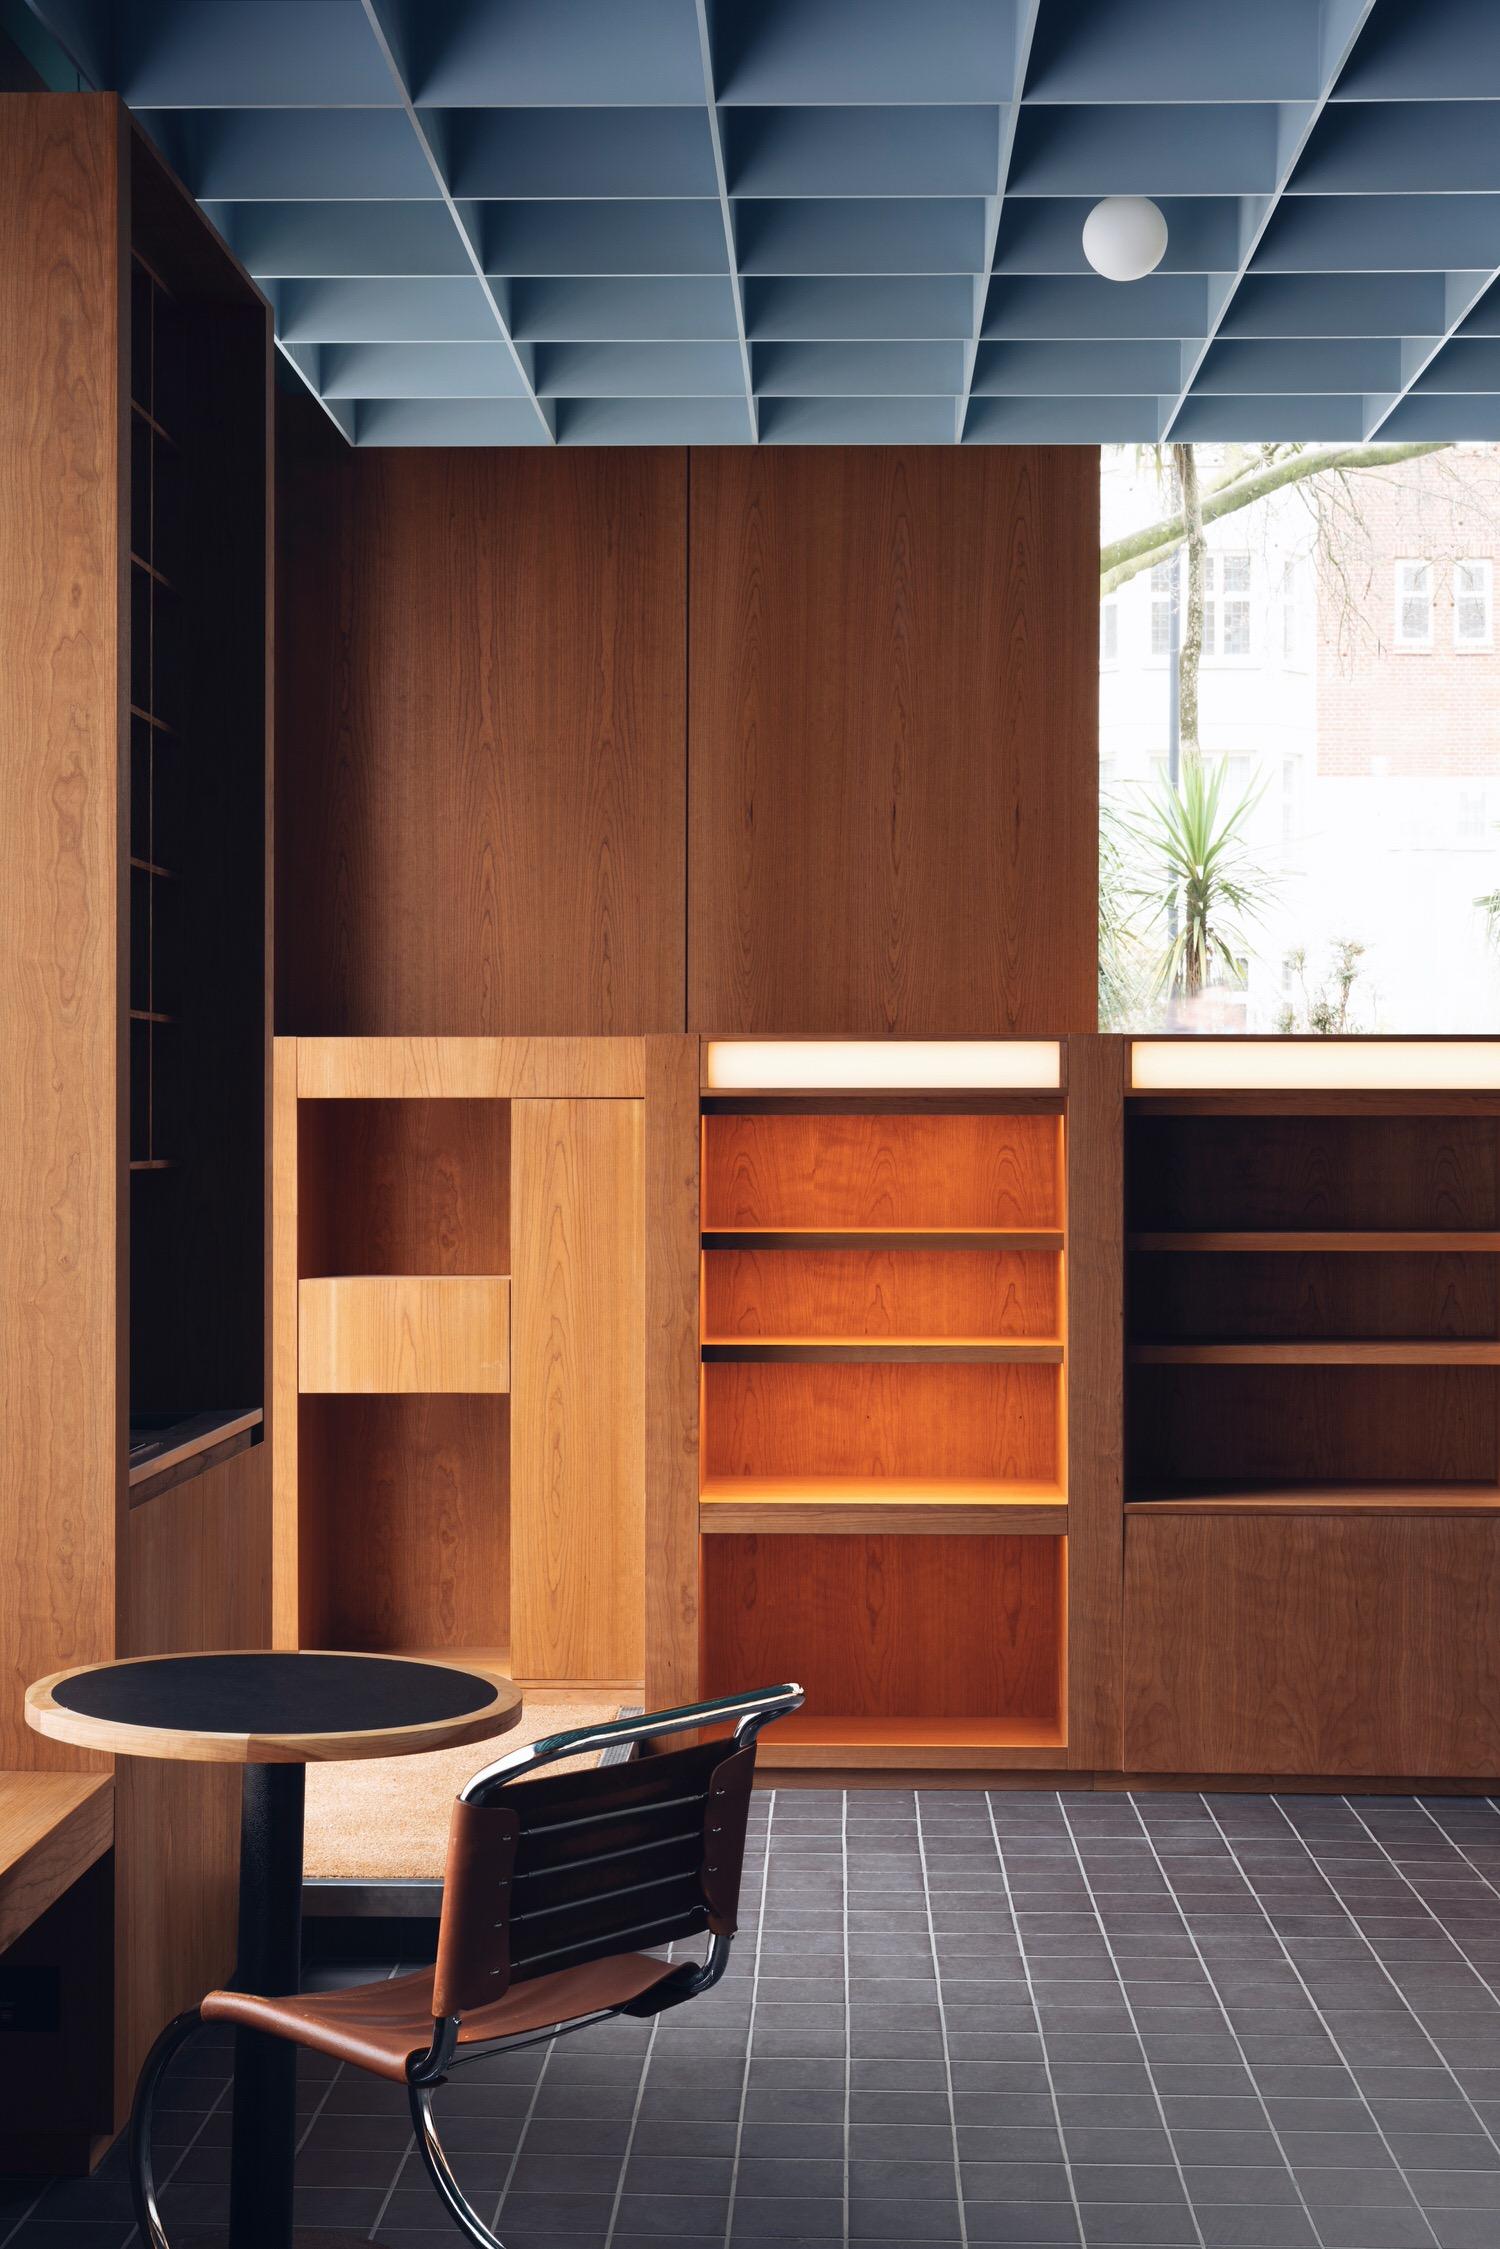 Child Studio, Maido Japanese Restaurant, London Hospitality Interiors | Yellowtrace